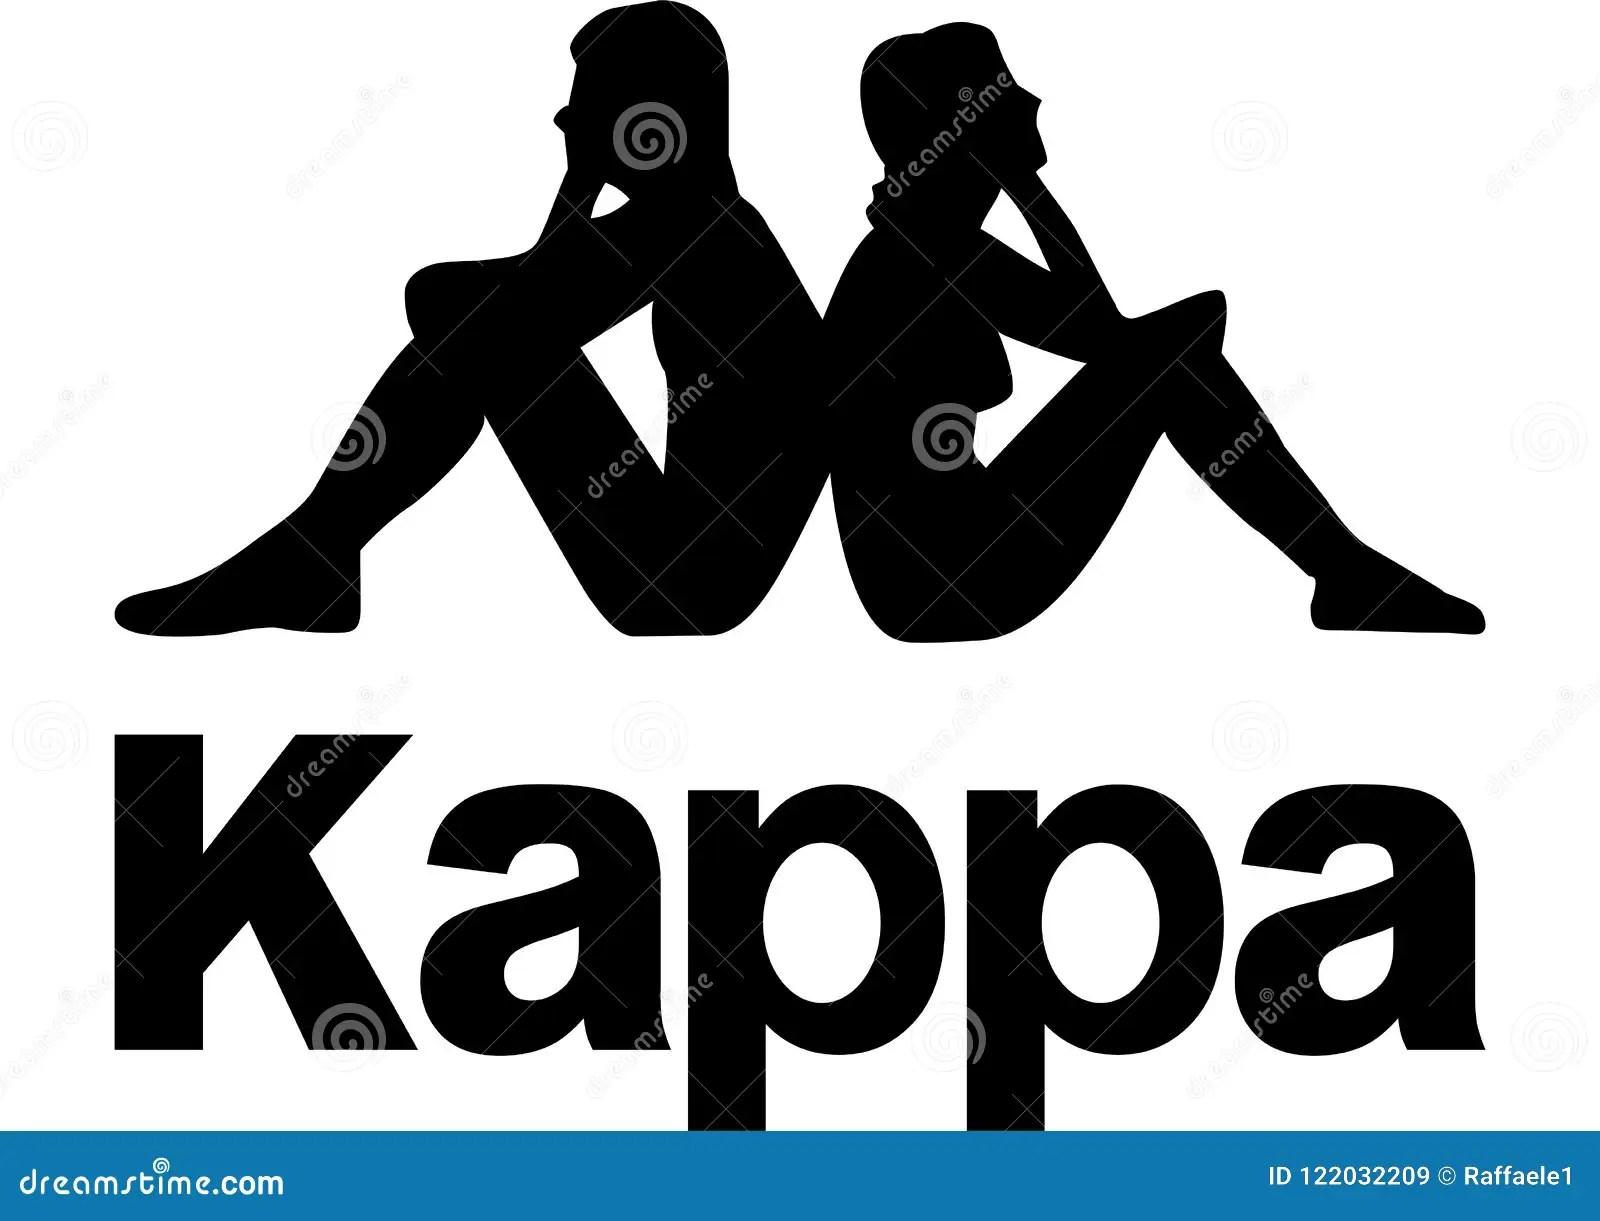 Kappa Logo Editorial Stock Image. Illustration Of Logo